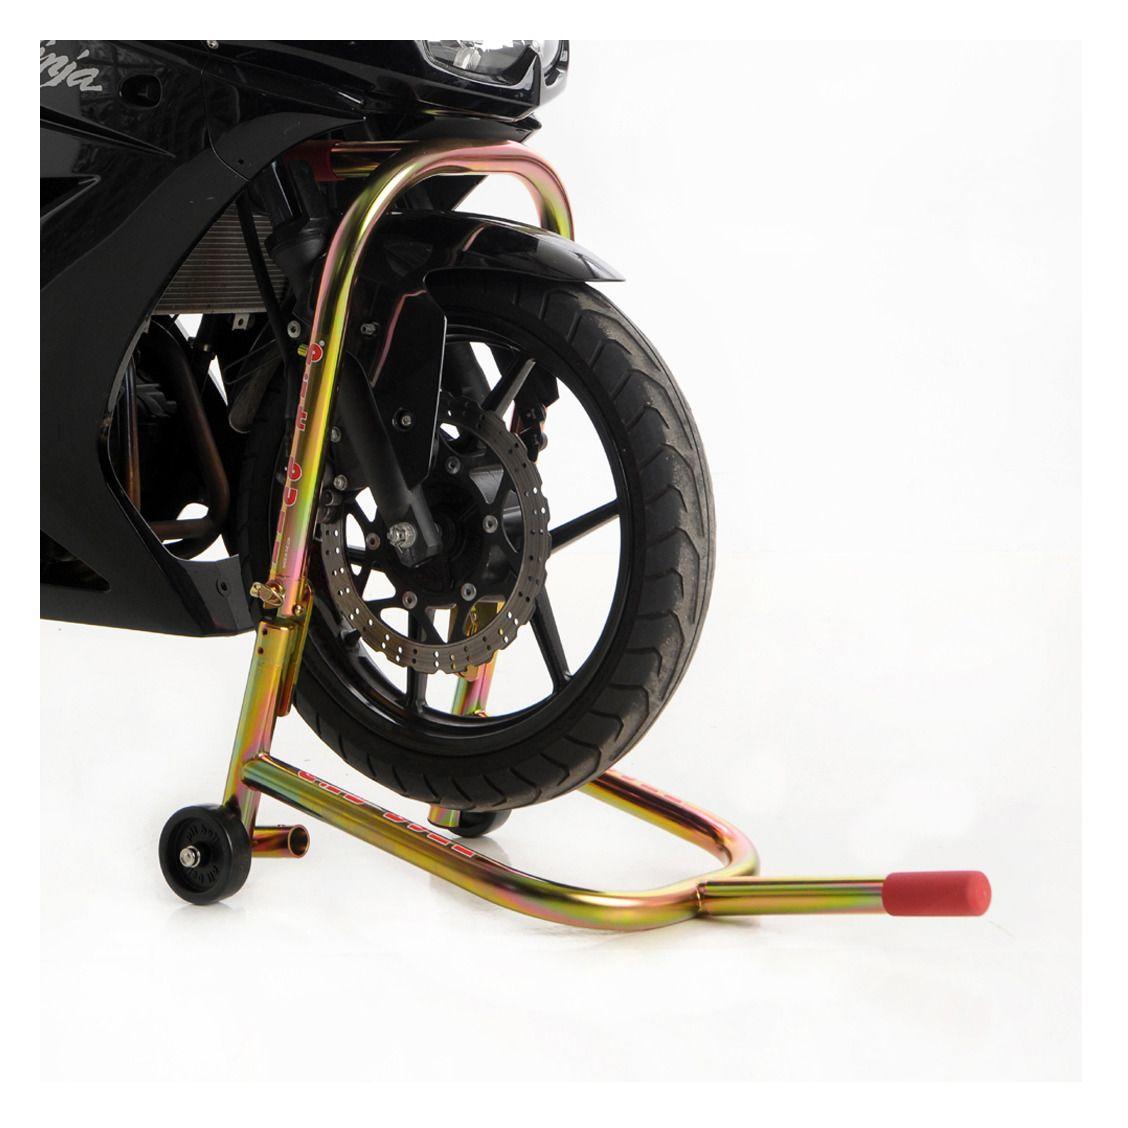 Parts for 2007 Suzuki GSX-R600 - Cycle Gear